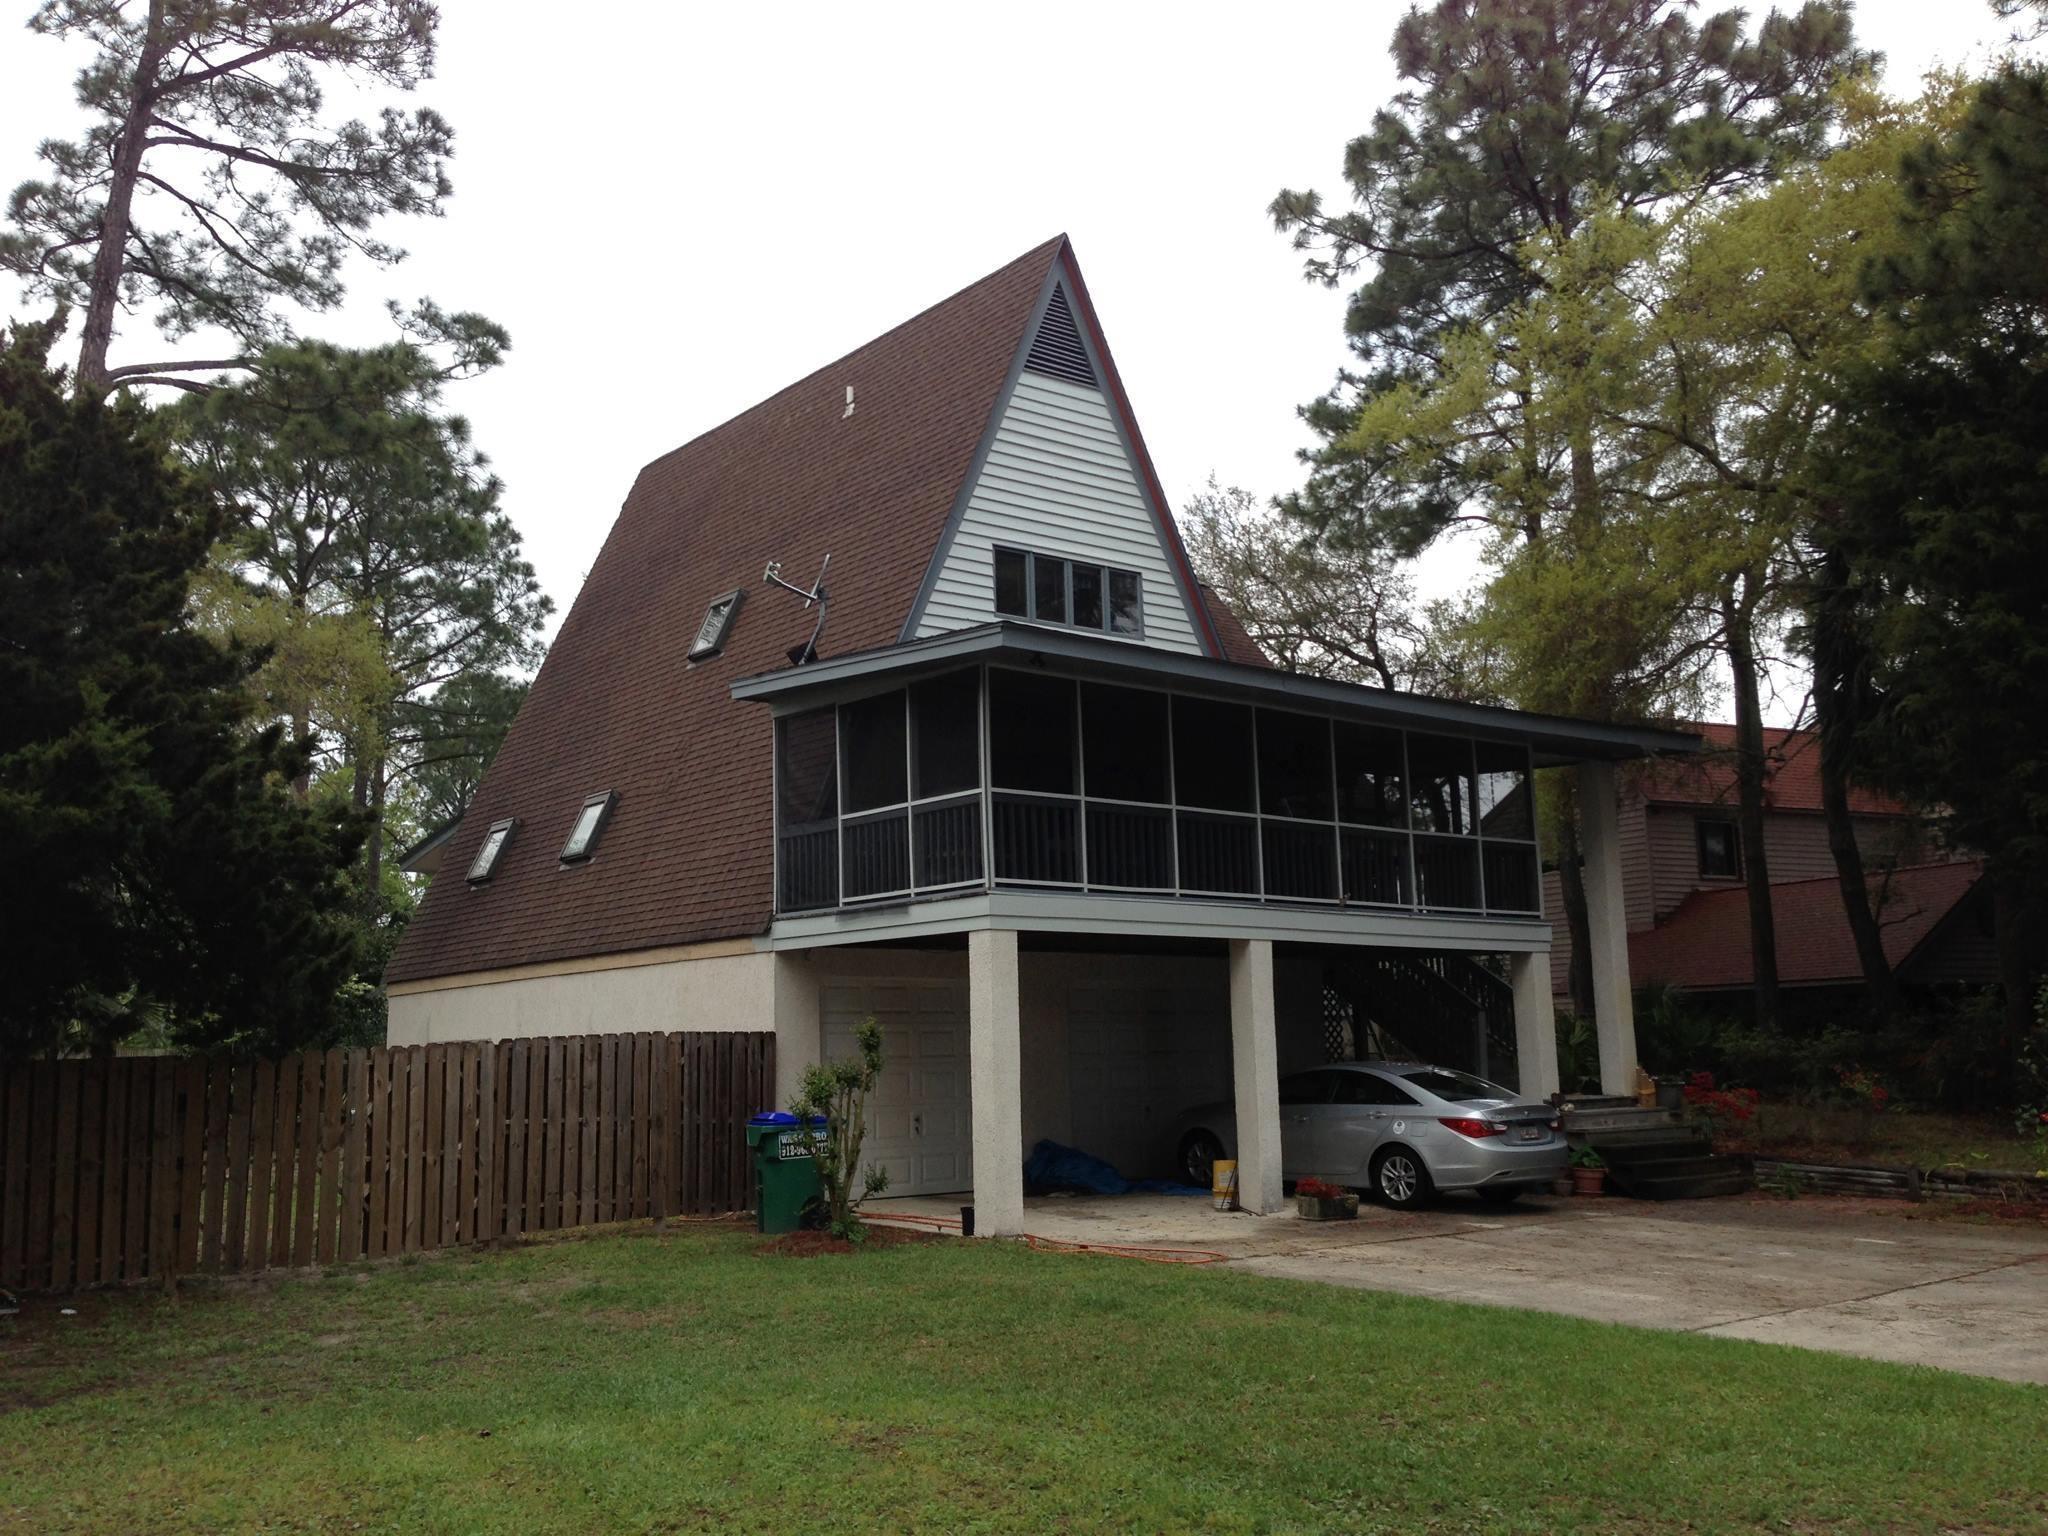 RoofCrafters-Savannah image 71